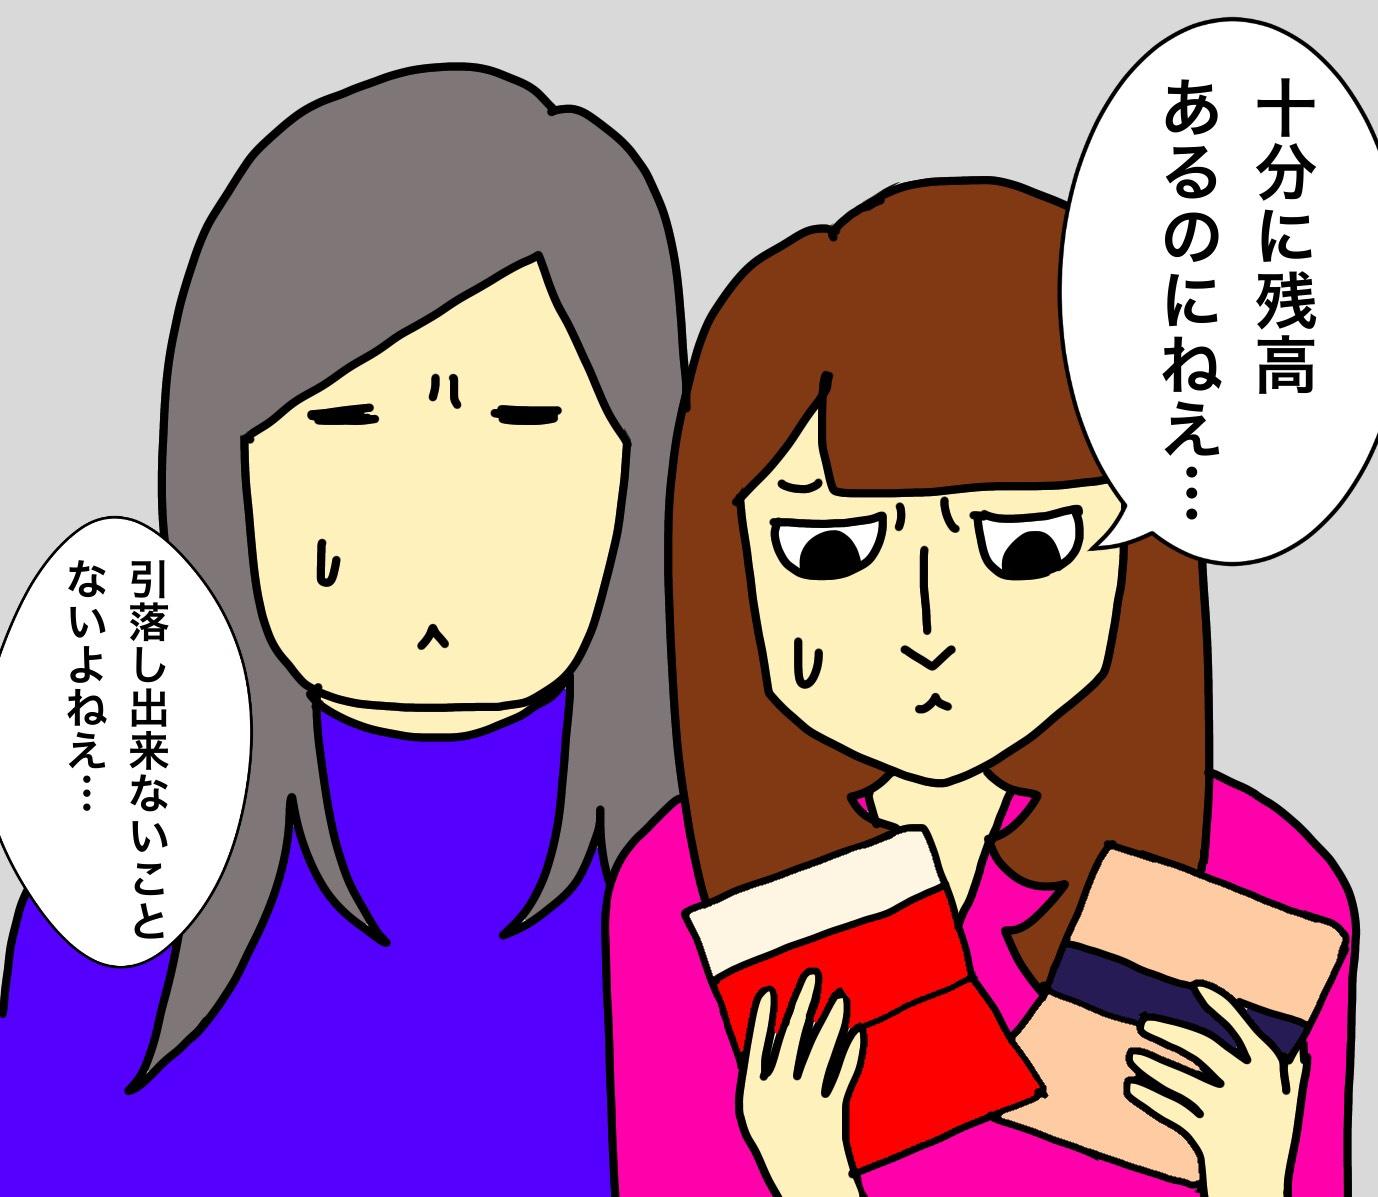 Image-25.jpeg